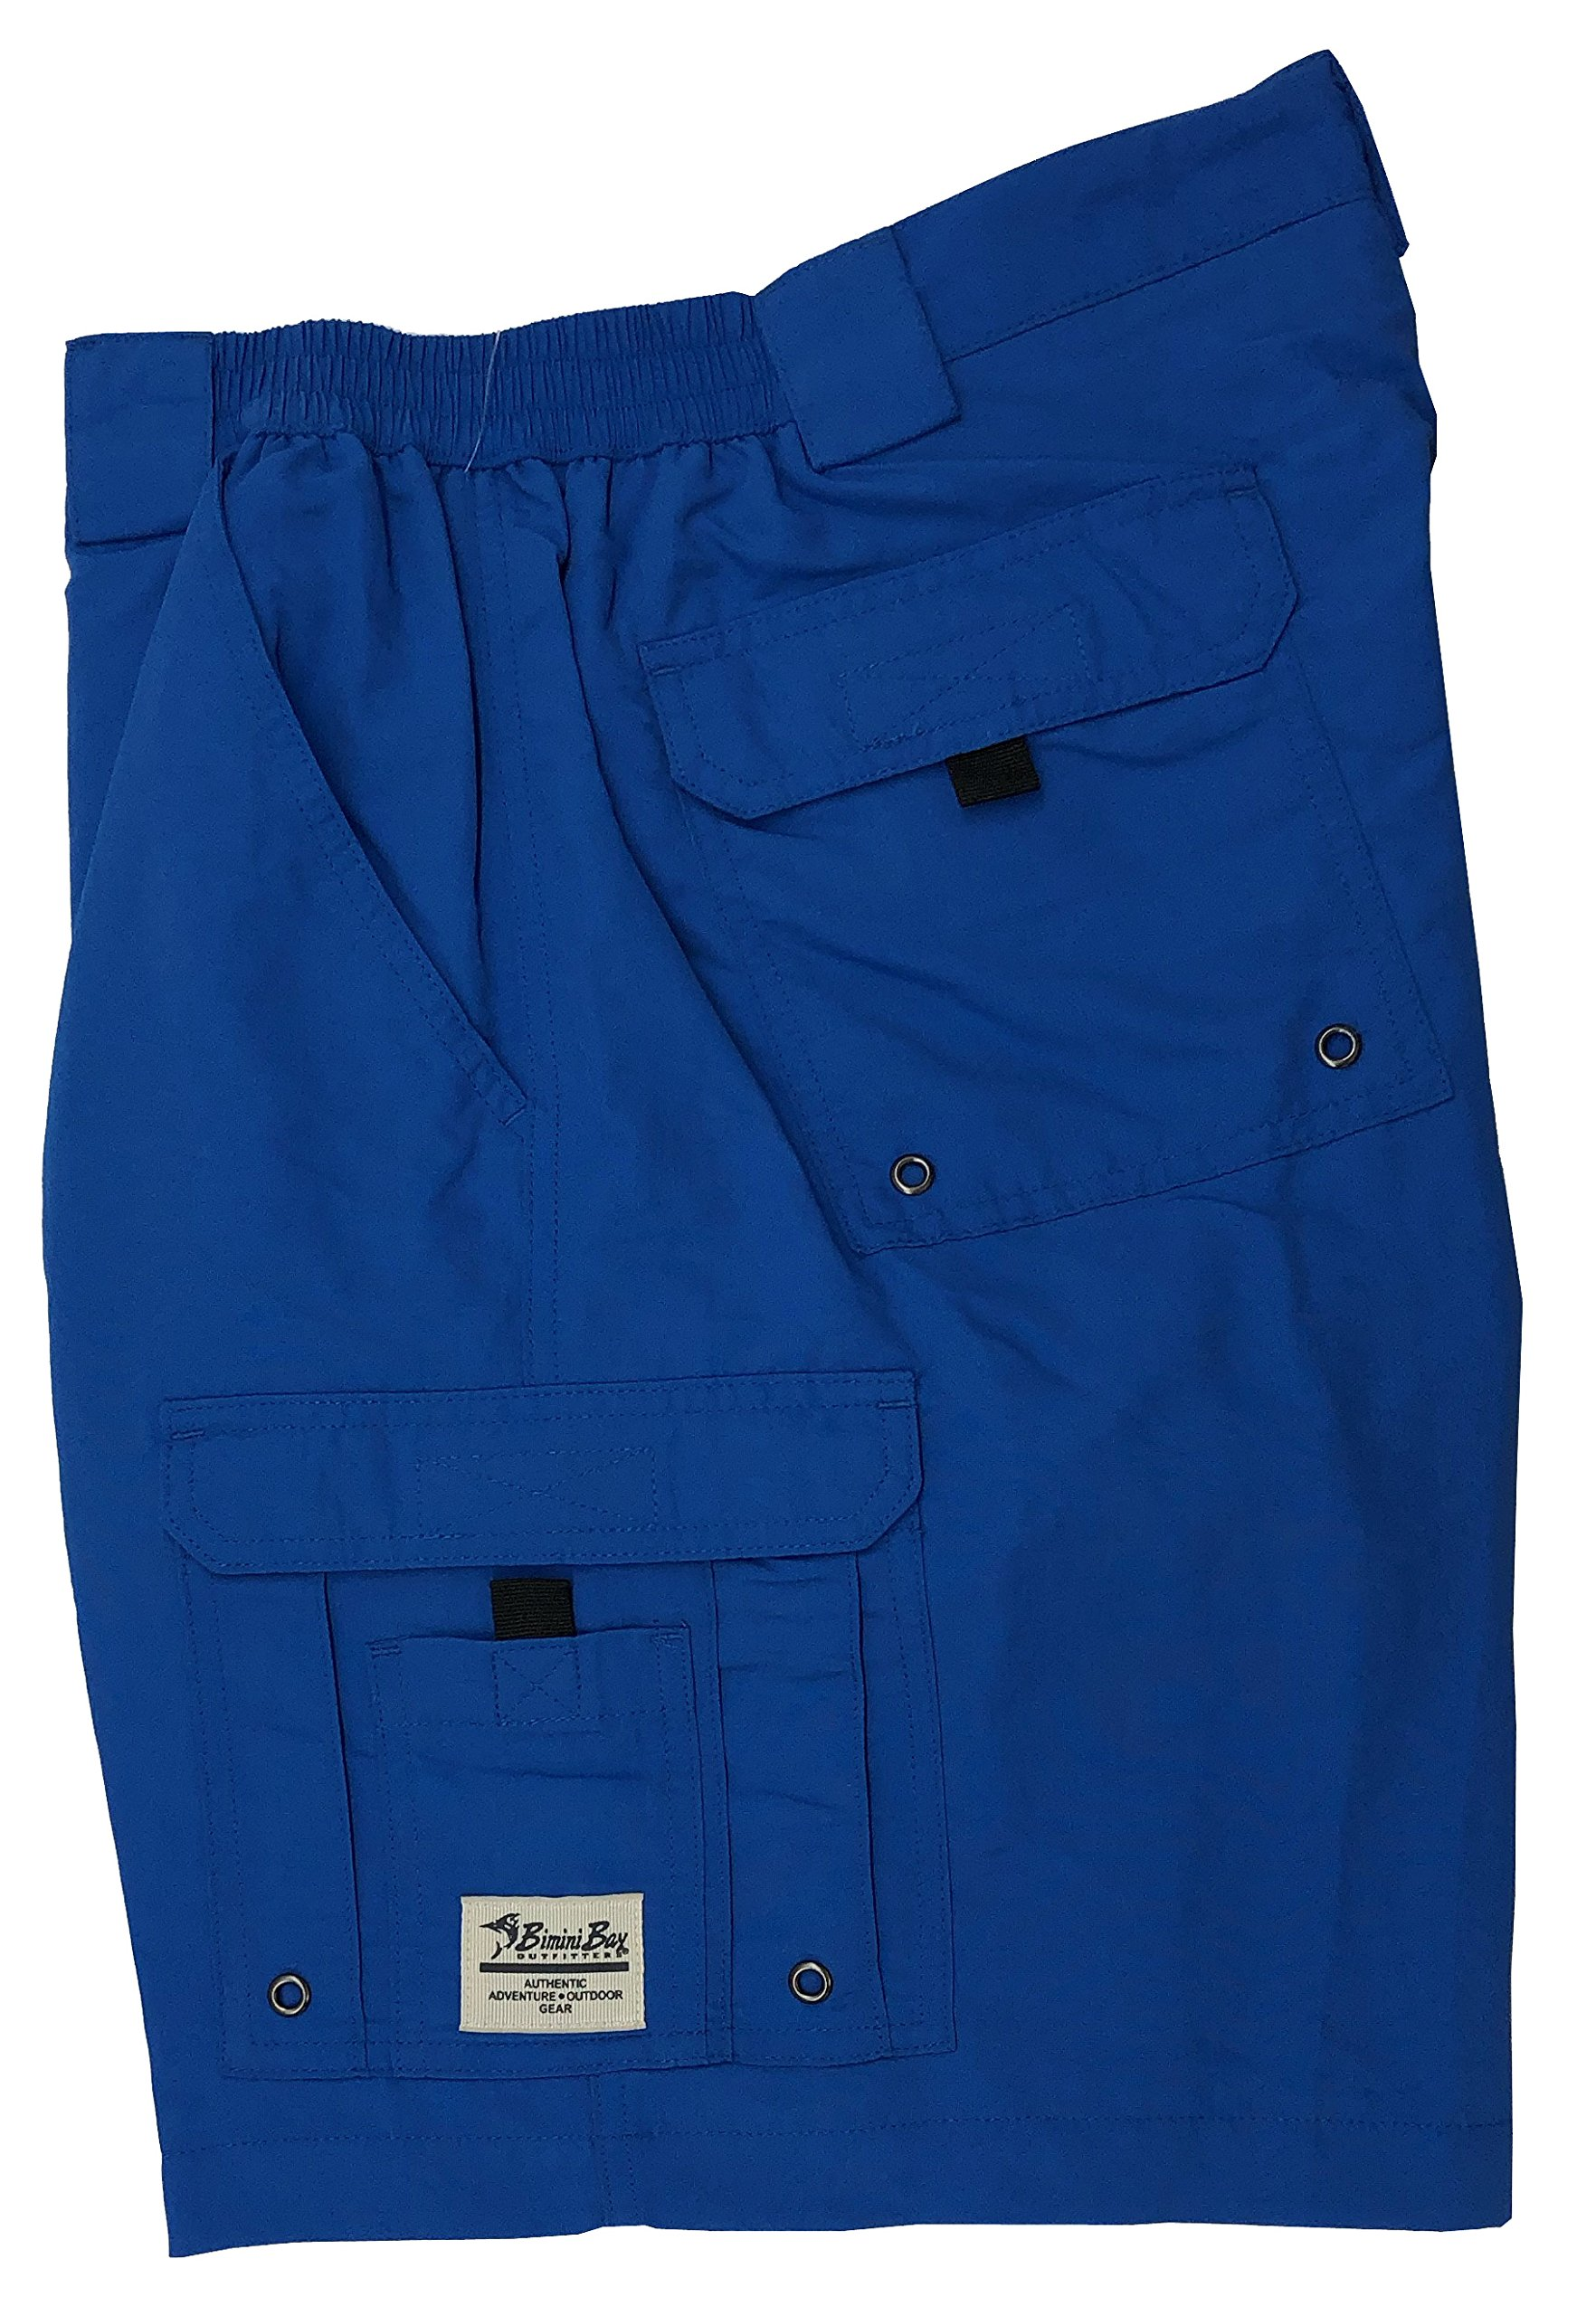 Bimini Bay Outfitters Boca Grande Nylon Short (2-Pack) (Ocean, 44) by Bimini Bay Outfitters